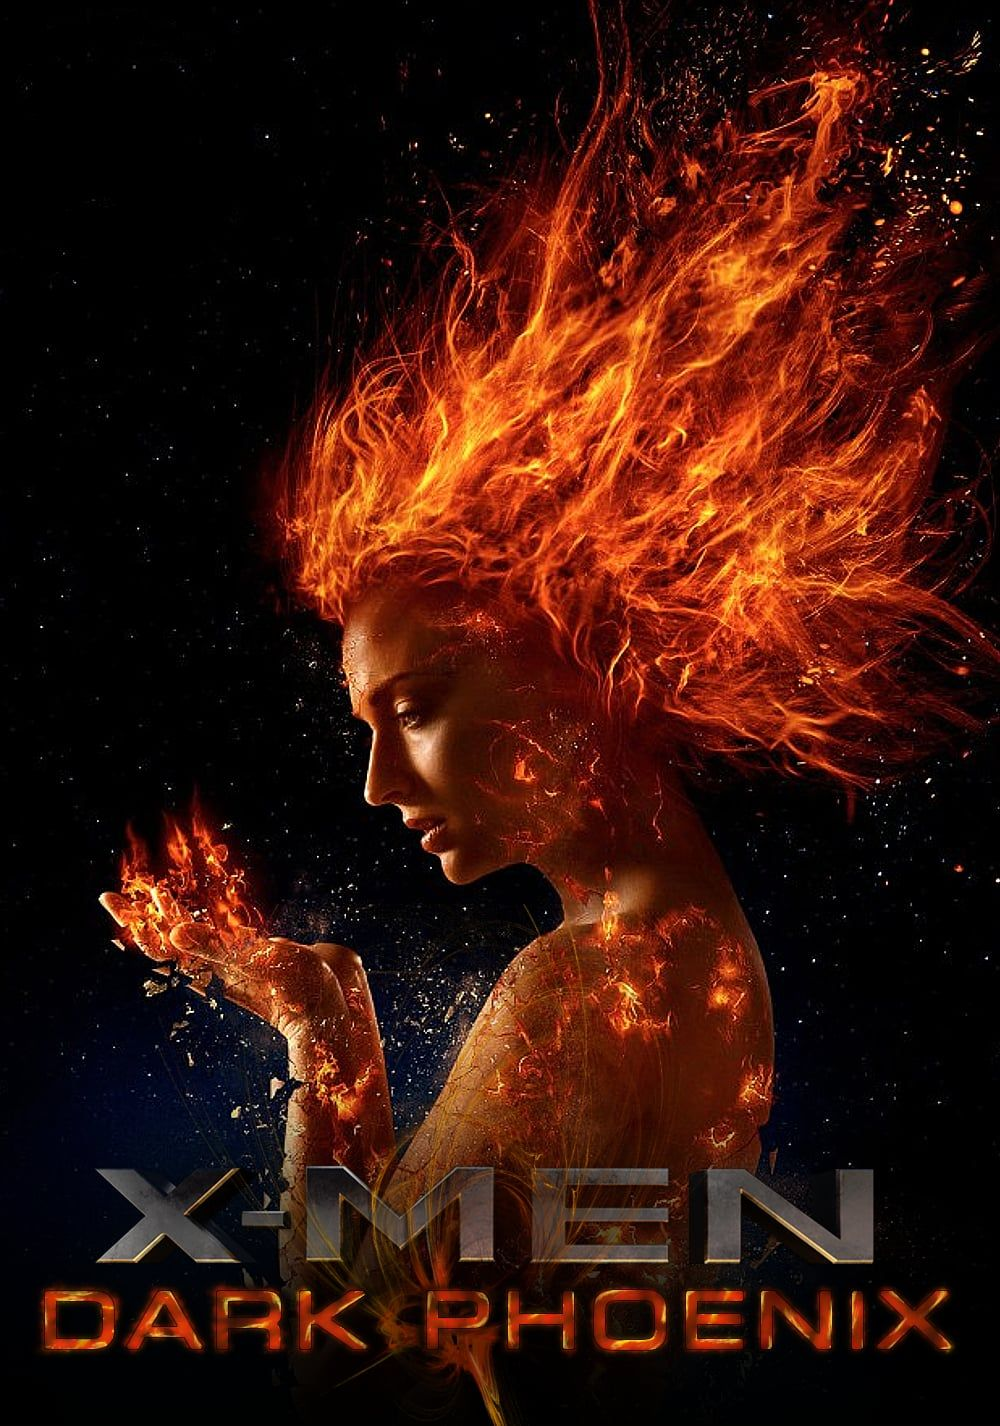 X Men Dark Phoenix 2019 Dark Phoenix Jean Grey X Men